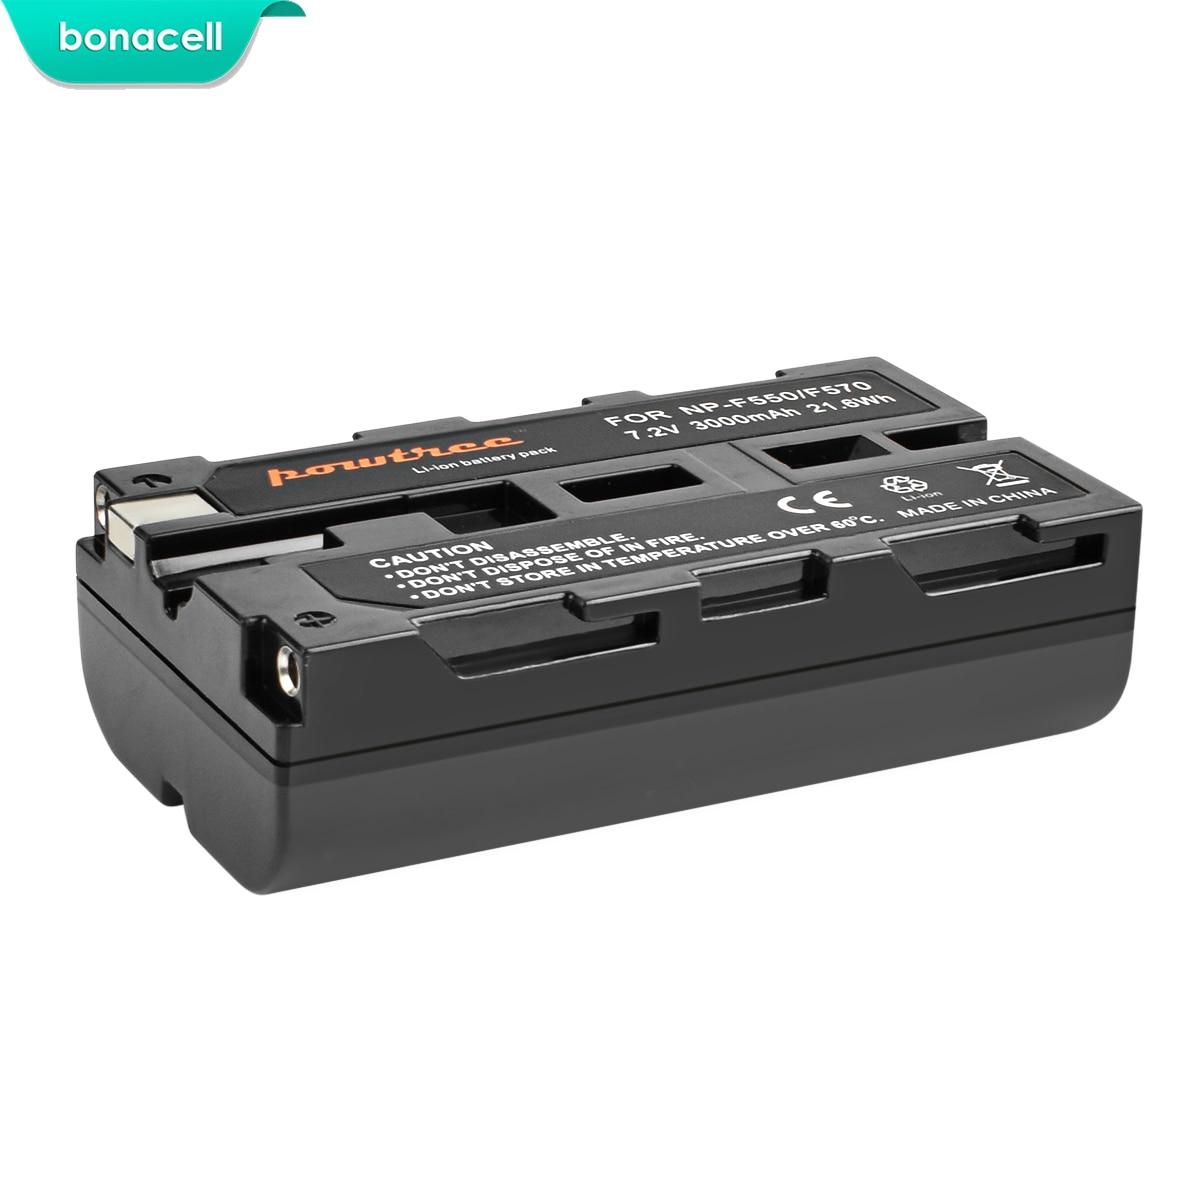 Bonacell 3000mAh NP F550 NP F550 NPF550 Battery LCD Dual Charger for Sony NP F330 NP F530 NP F570 NP F730 NP F750 Hi 8 L10 in Digital Batteries from Consumer Electronics